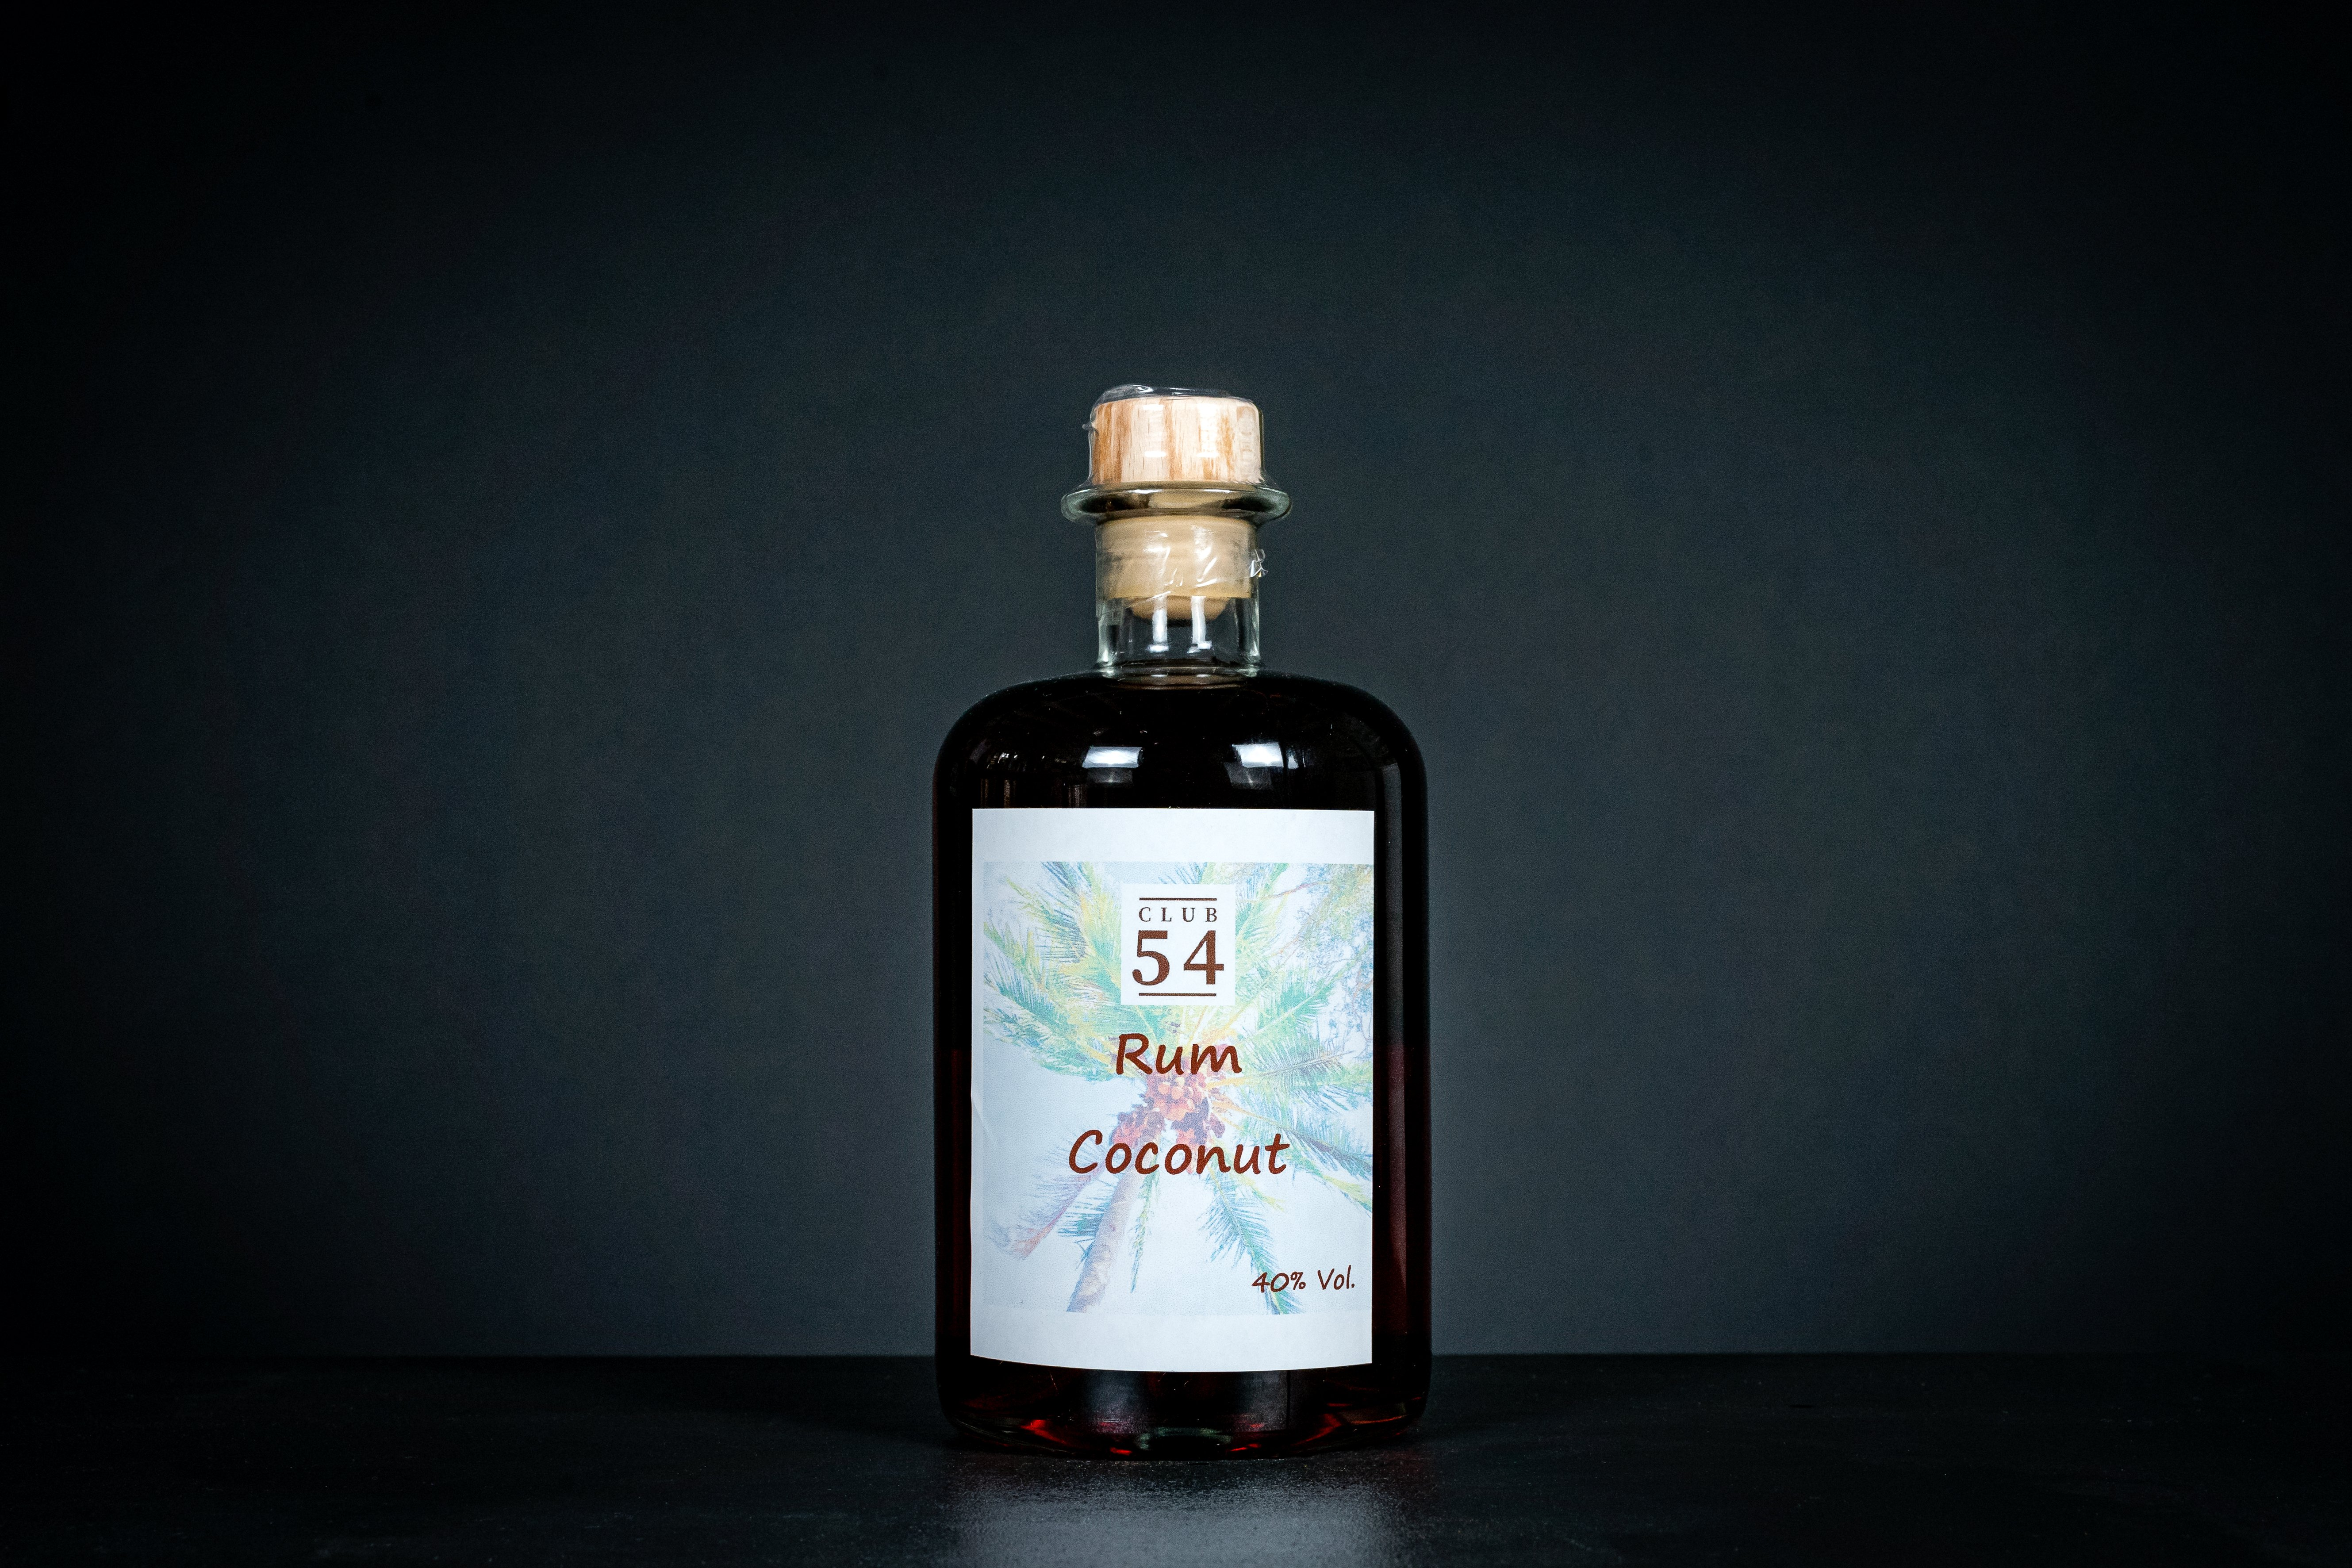 Club 54 Rum Coconut 0,5l 40%vol.